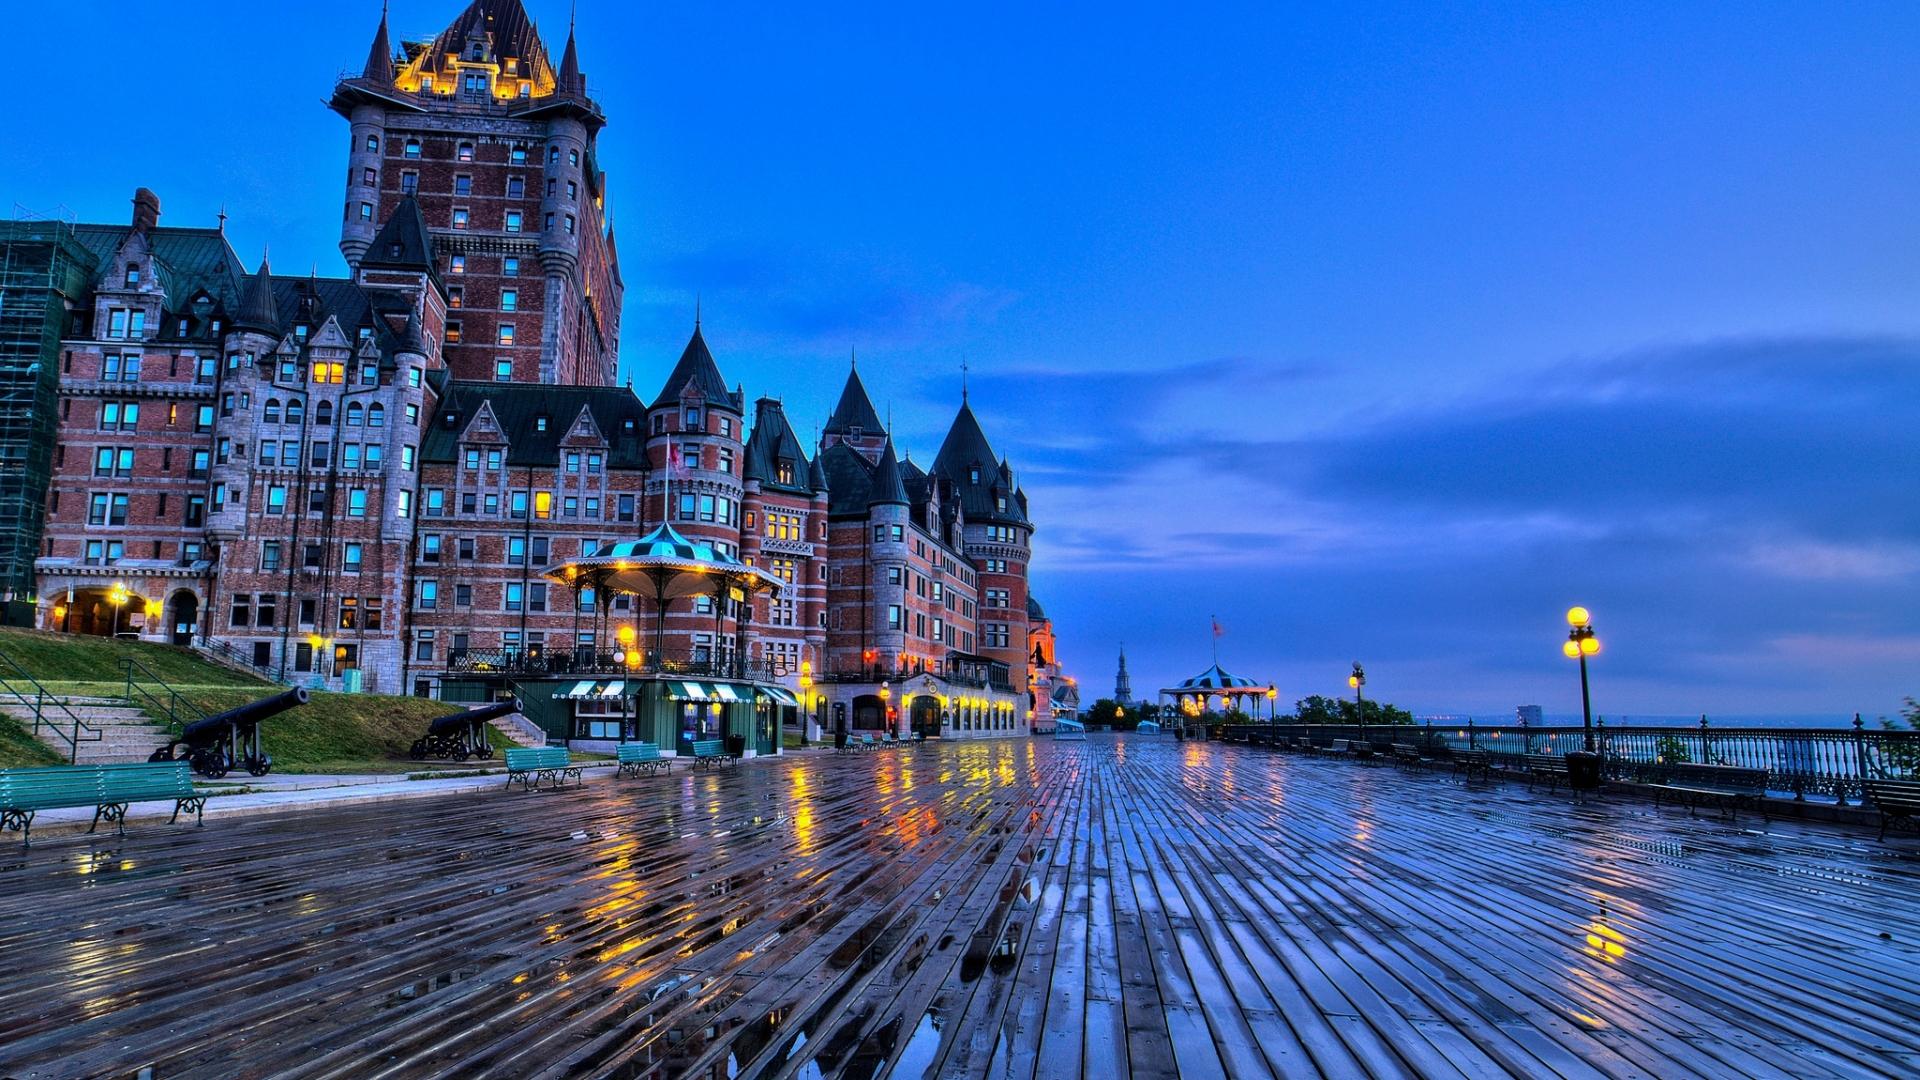 Quebec Pictures; Quebec Pictures; Quebec Pictures ...